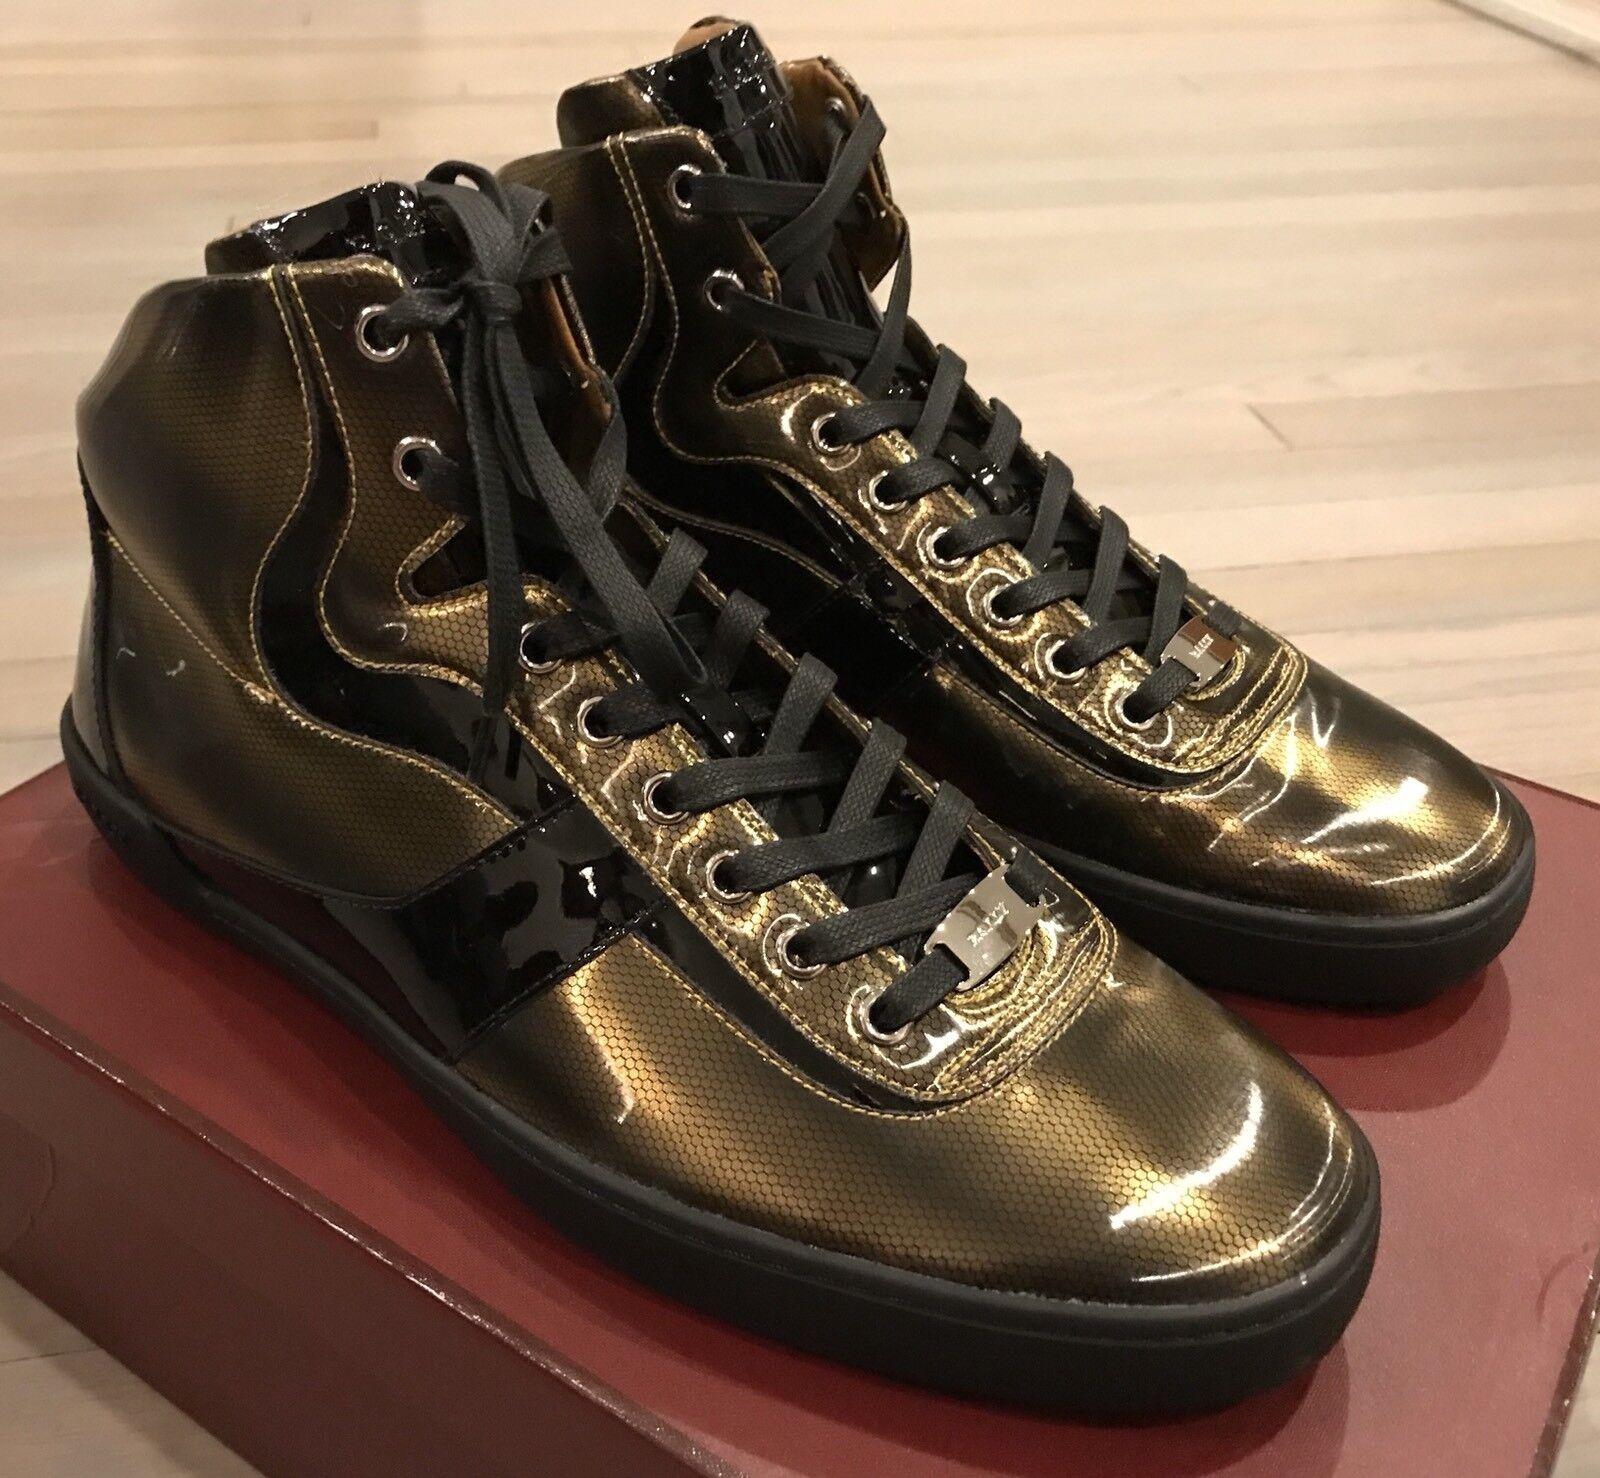 700  Bally Eroy 01 US Gold High Tops  size US 01 9.5 5d762b